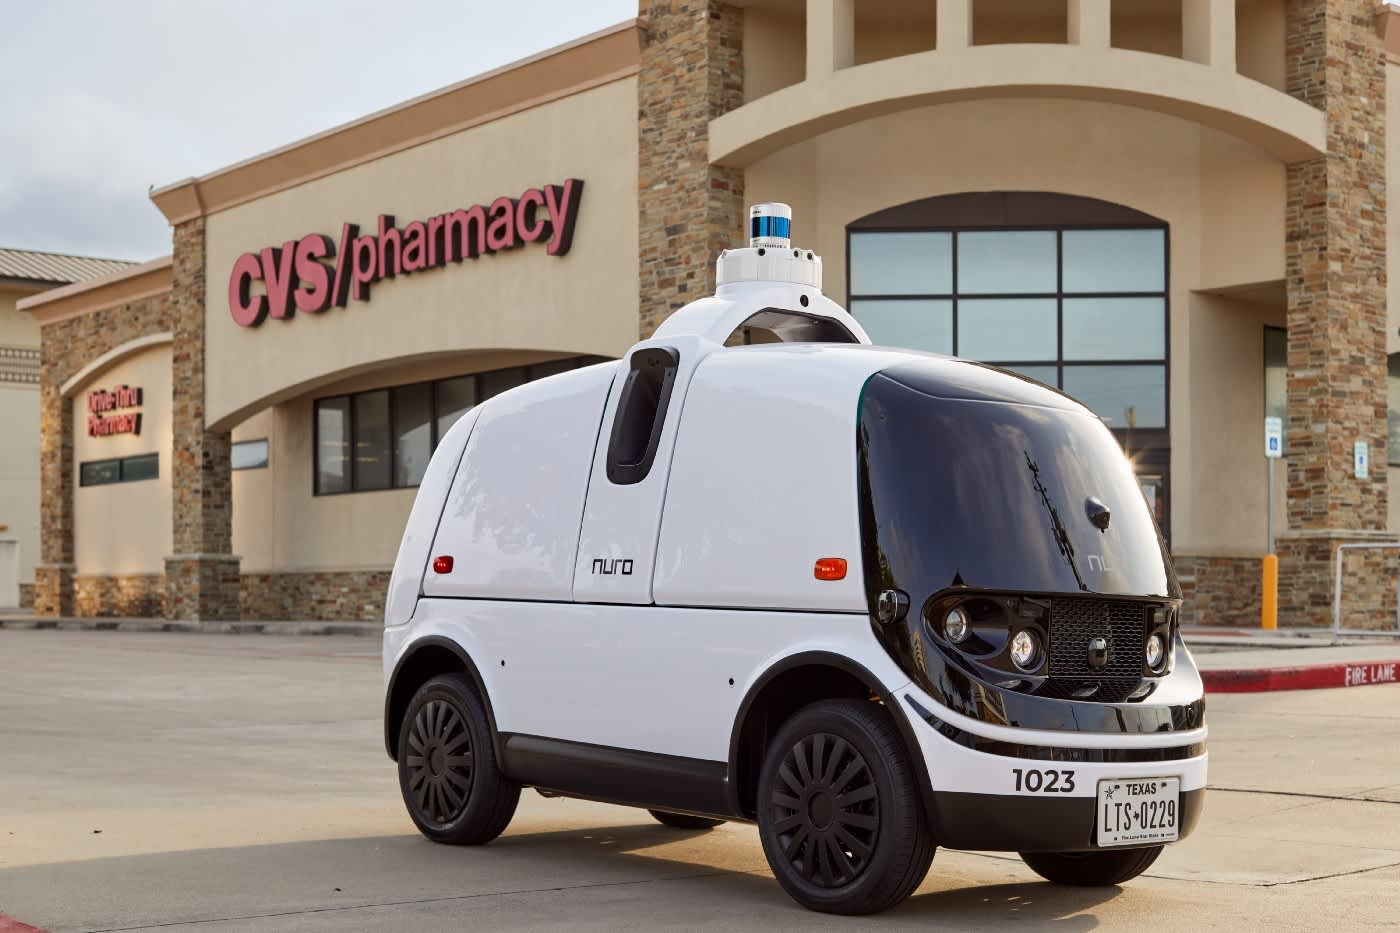 CVS Pharmacy, Nuro parter on driverless vehicle prescription delivery